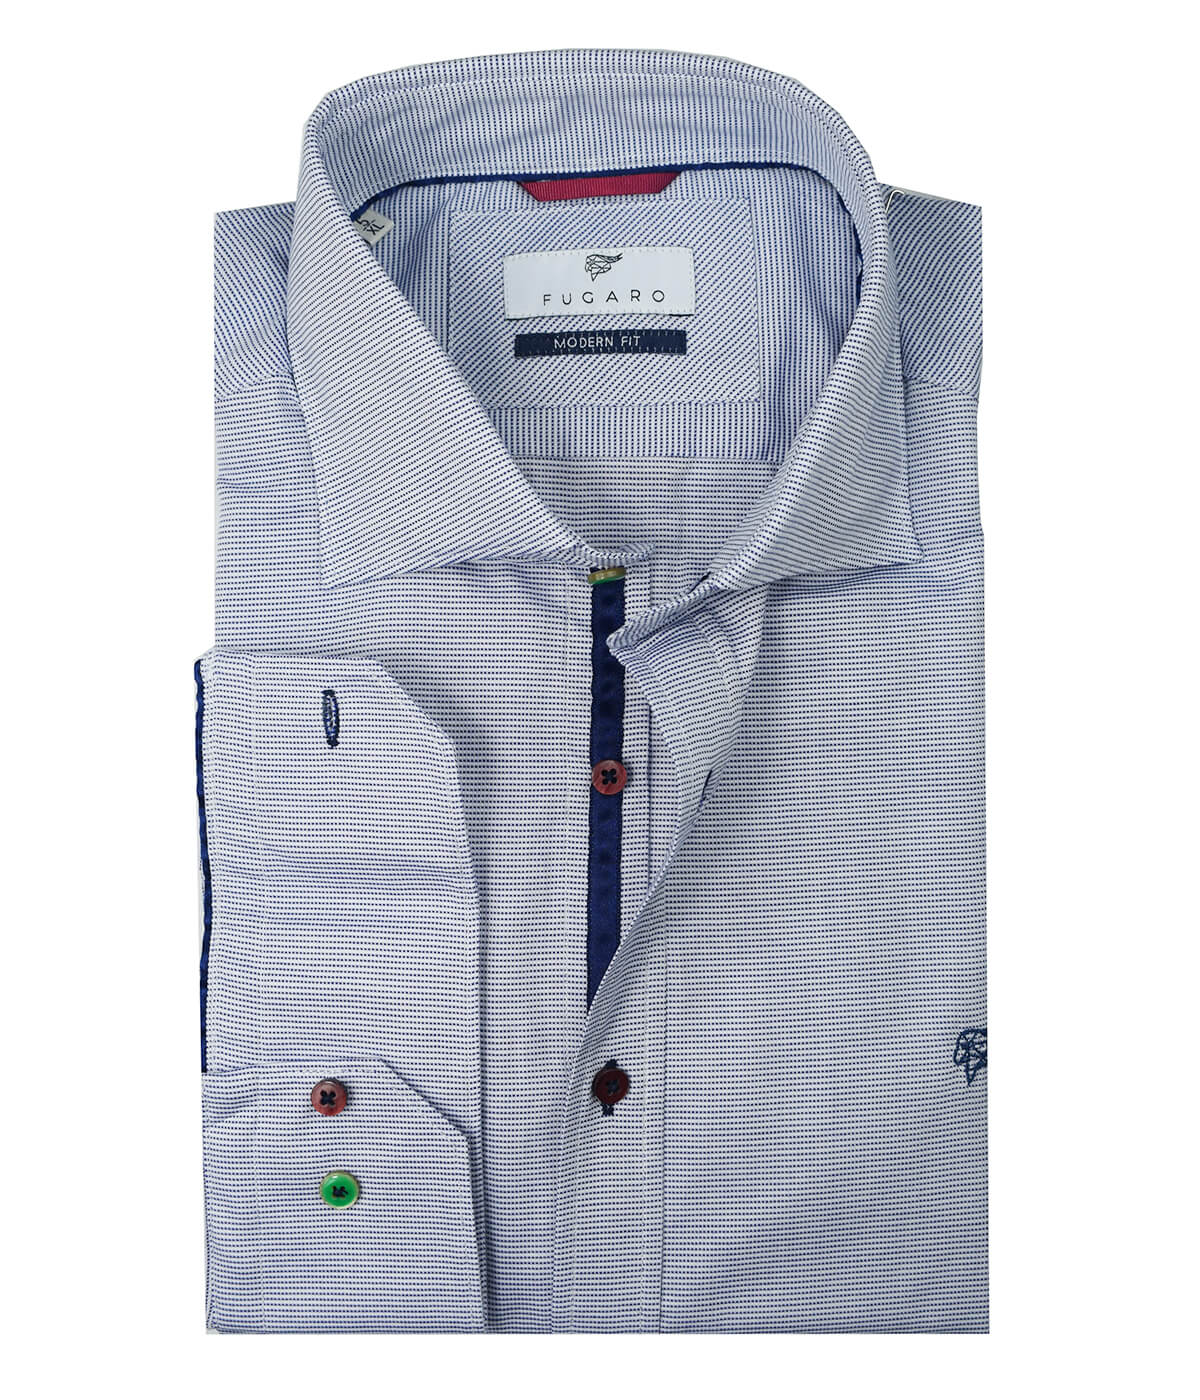 aa7a82e09 Micro print shirt